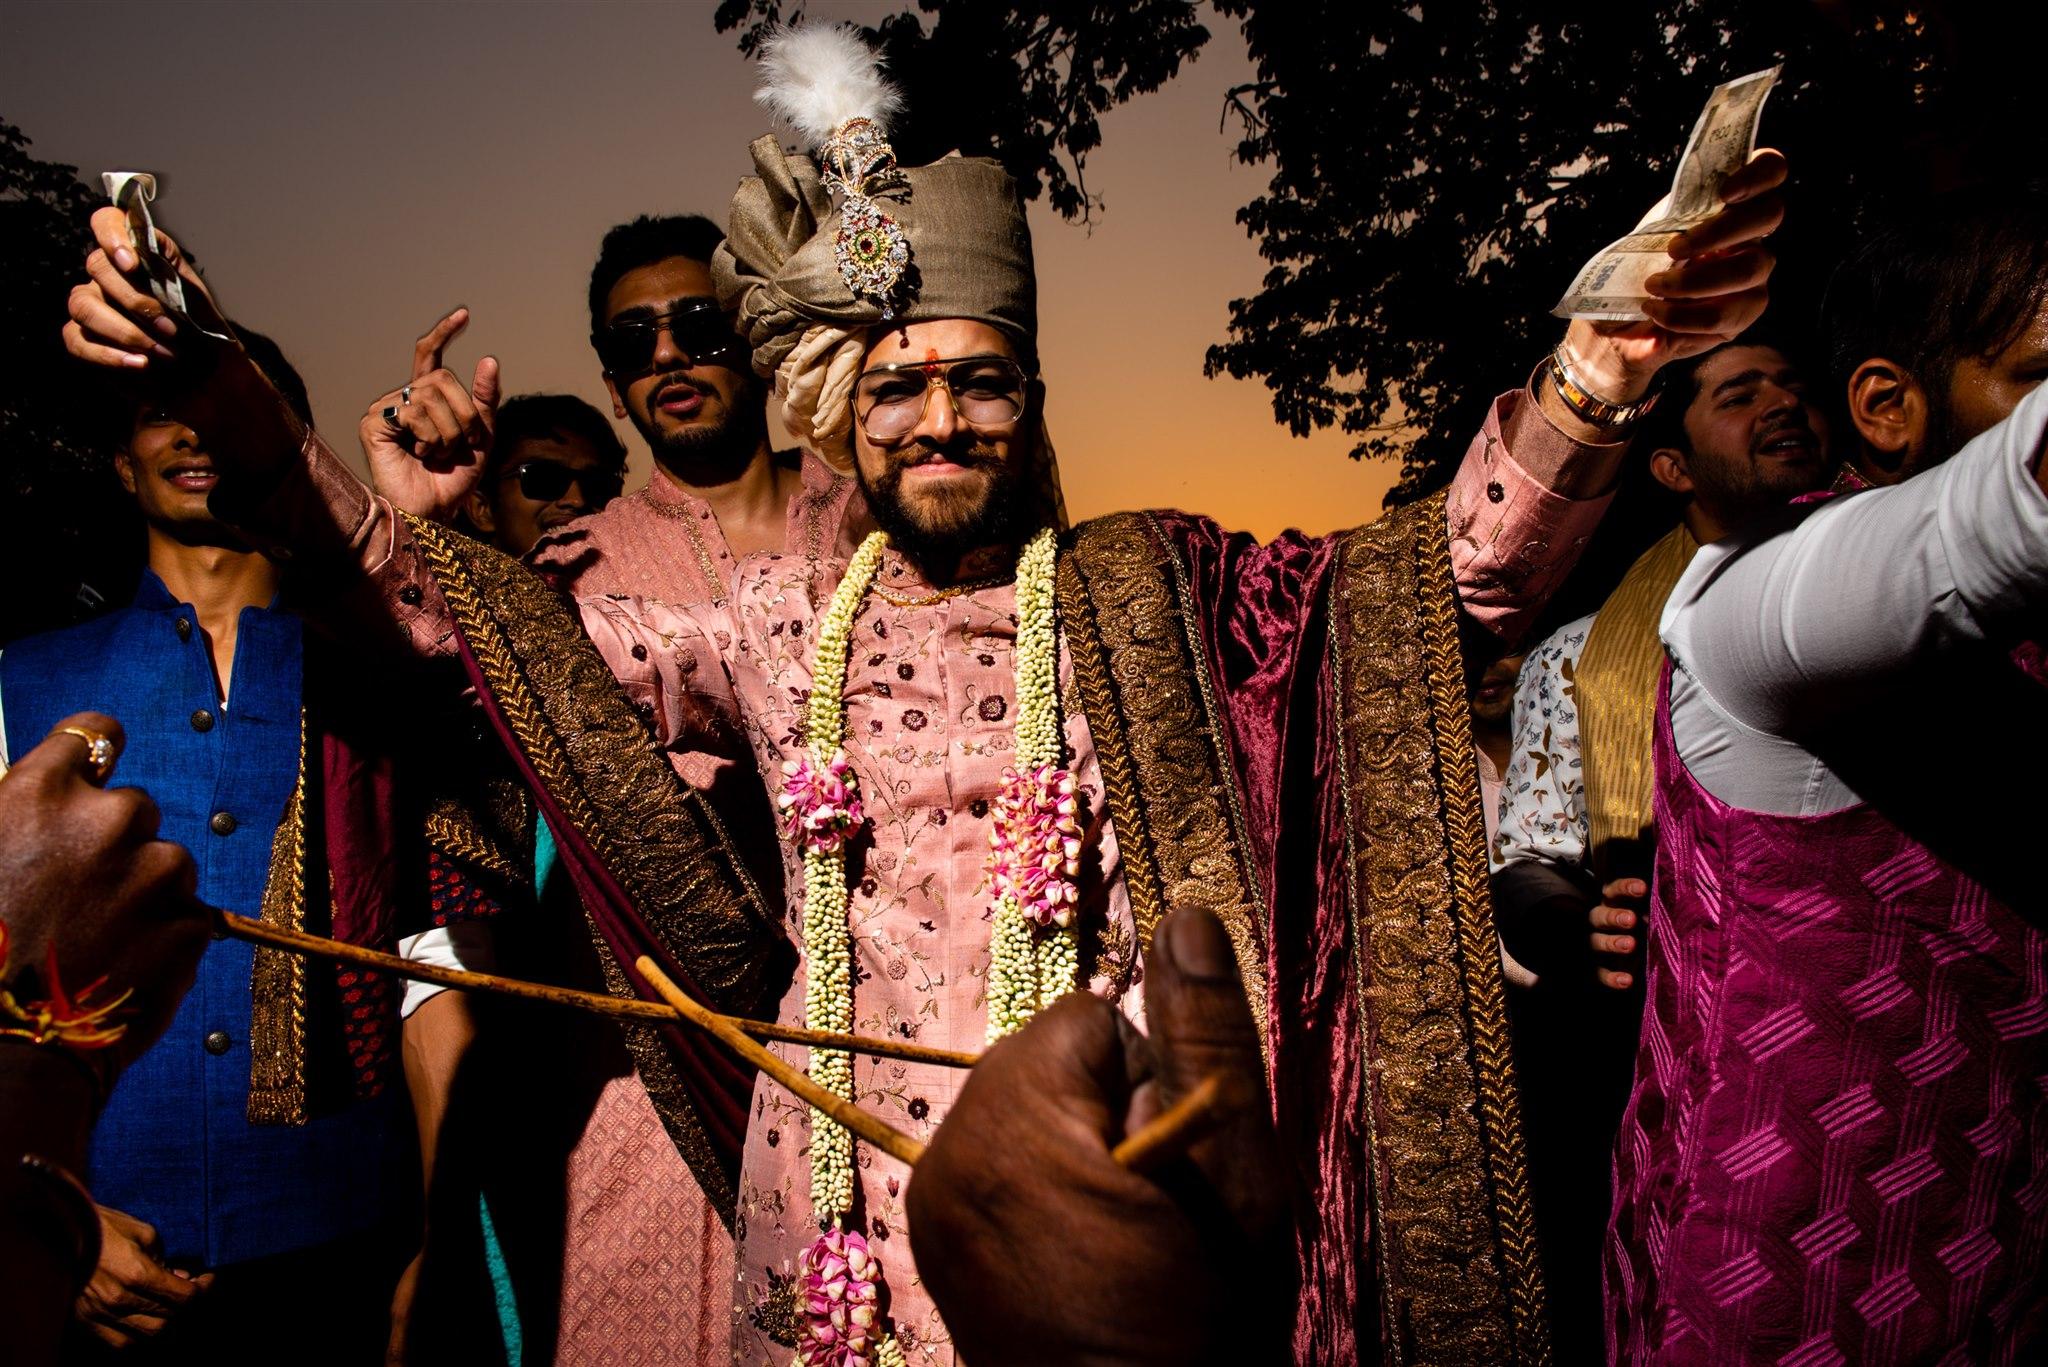 narracia-wygledacz-photographe-mariage-portfolio-16.jpg